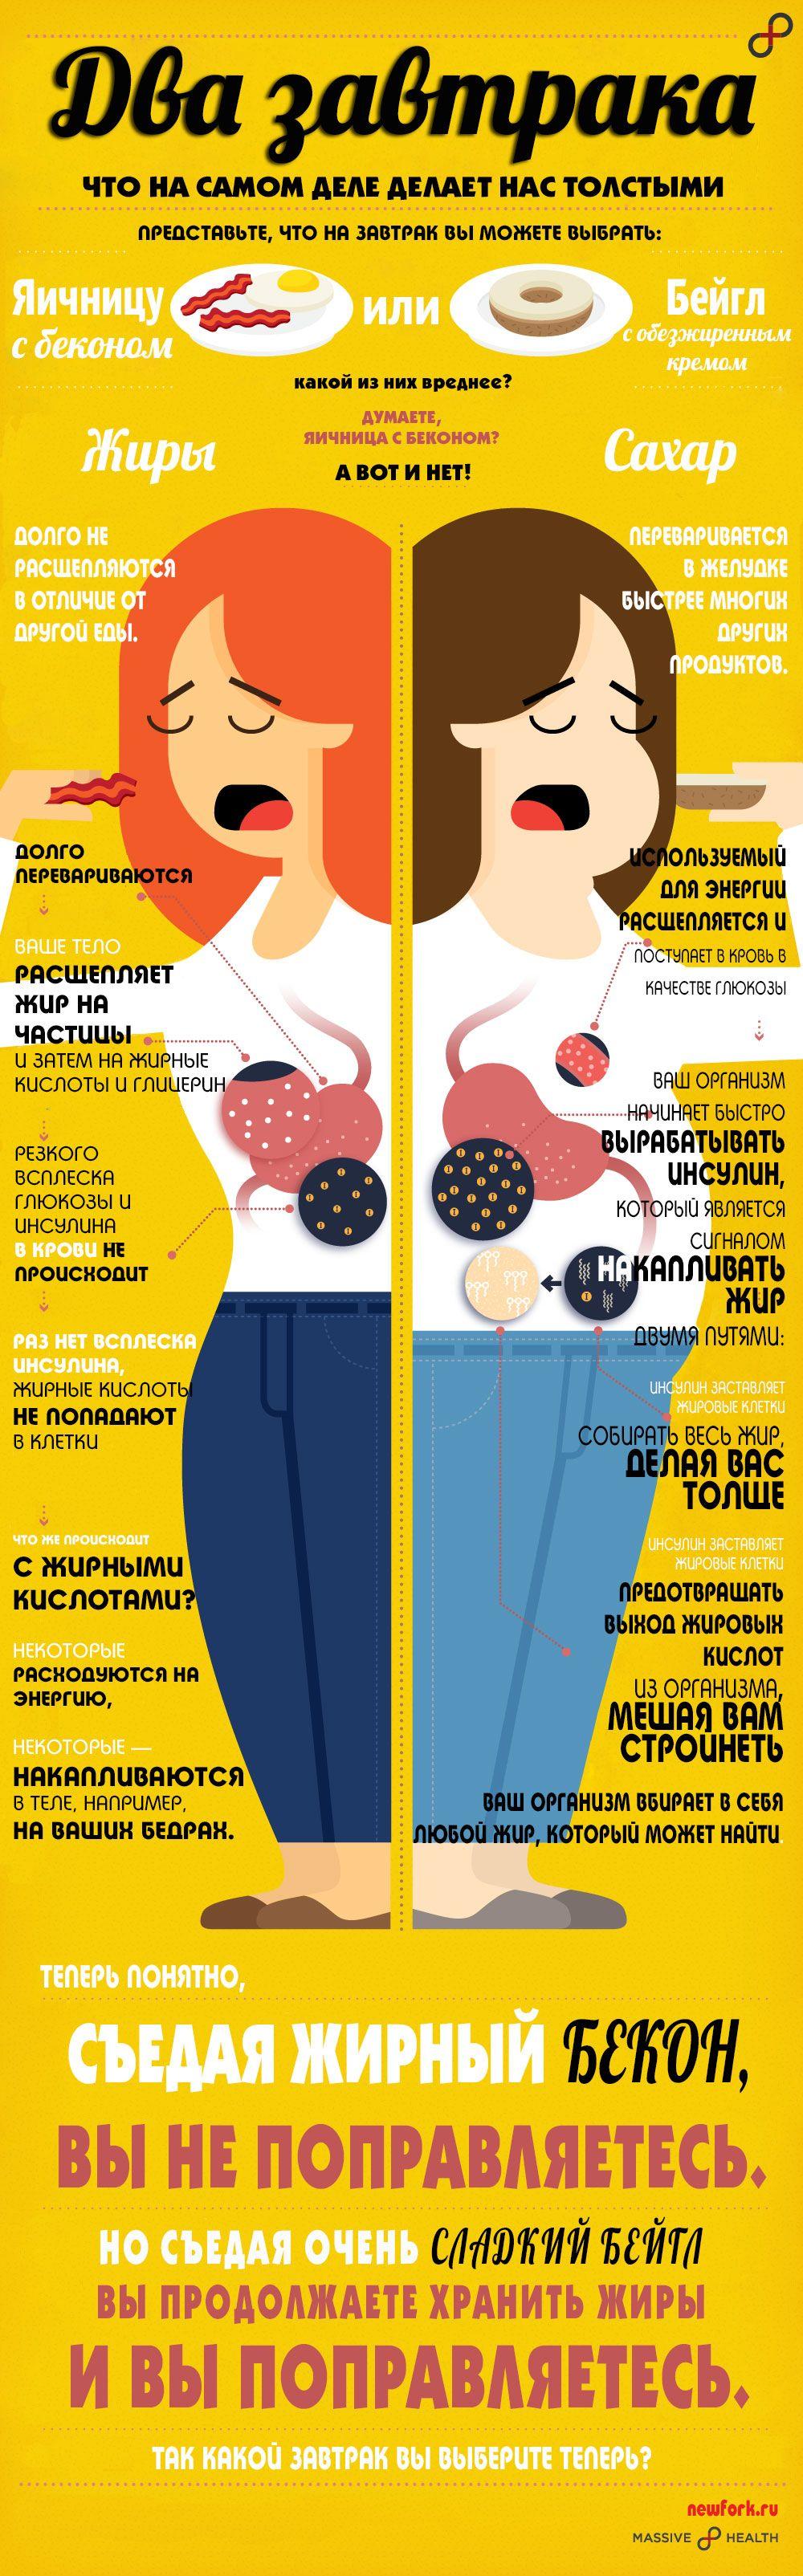 Инфографика: два завтрака